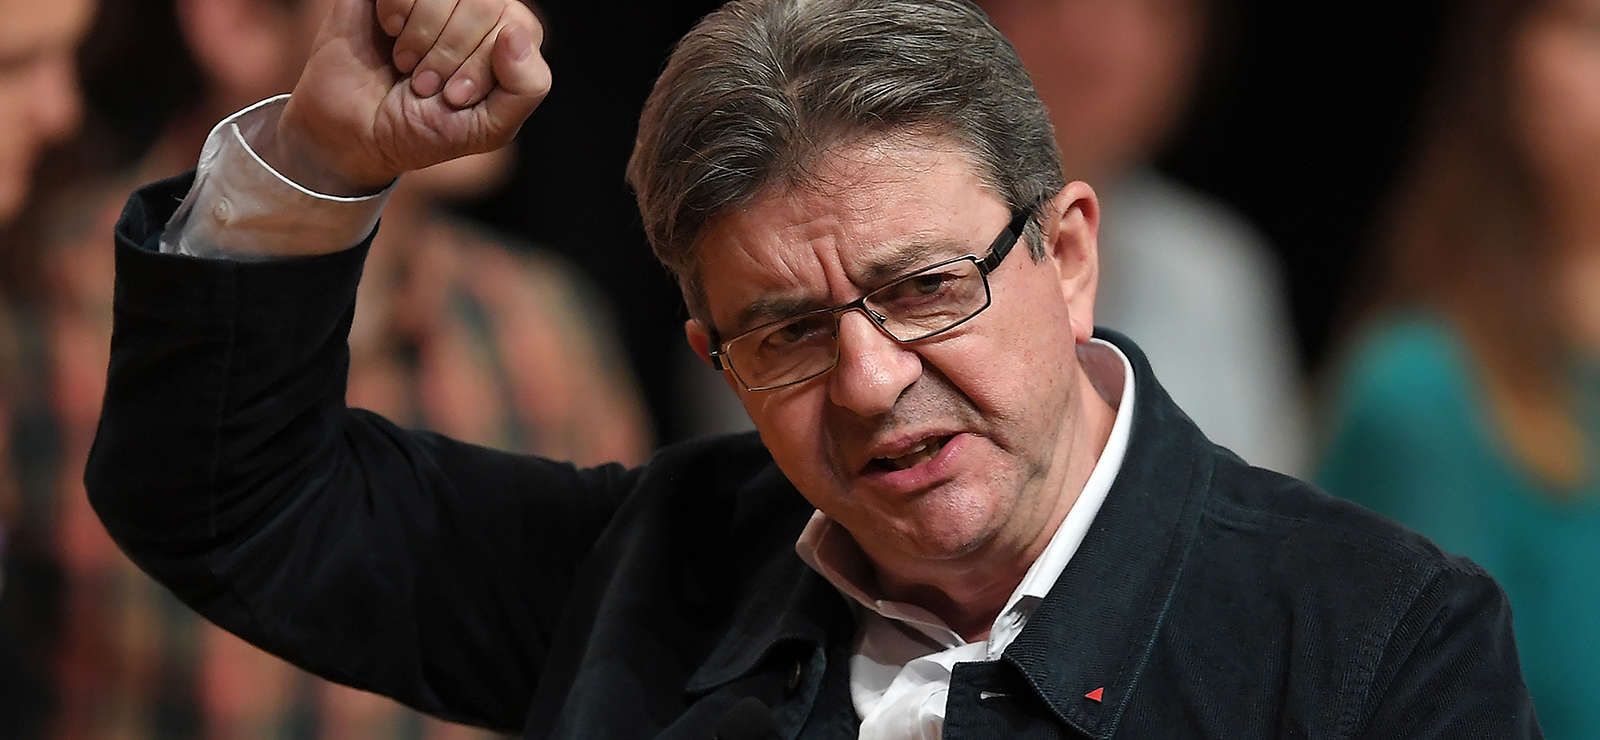 Hamon-Mélenchon: irréconciliables?